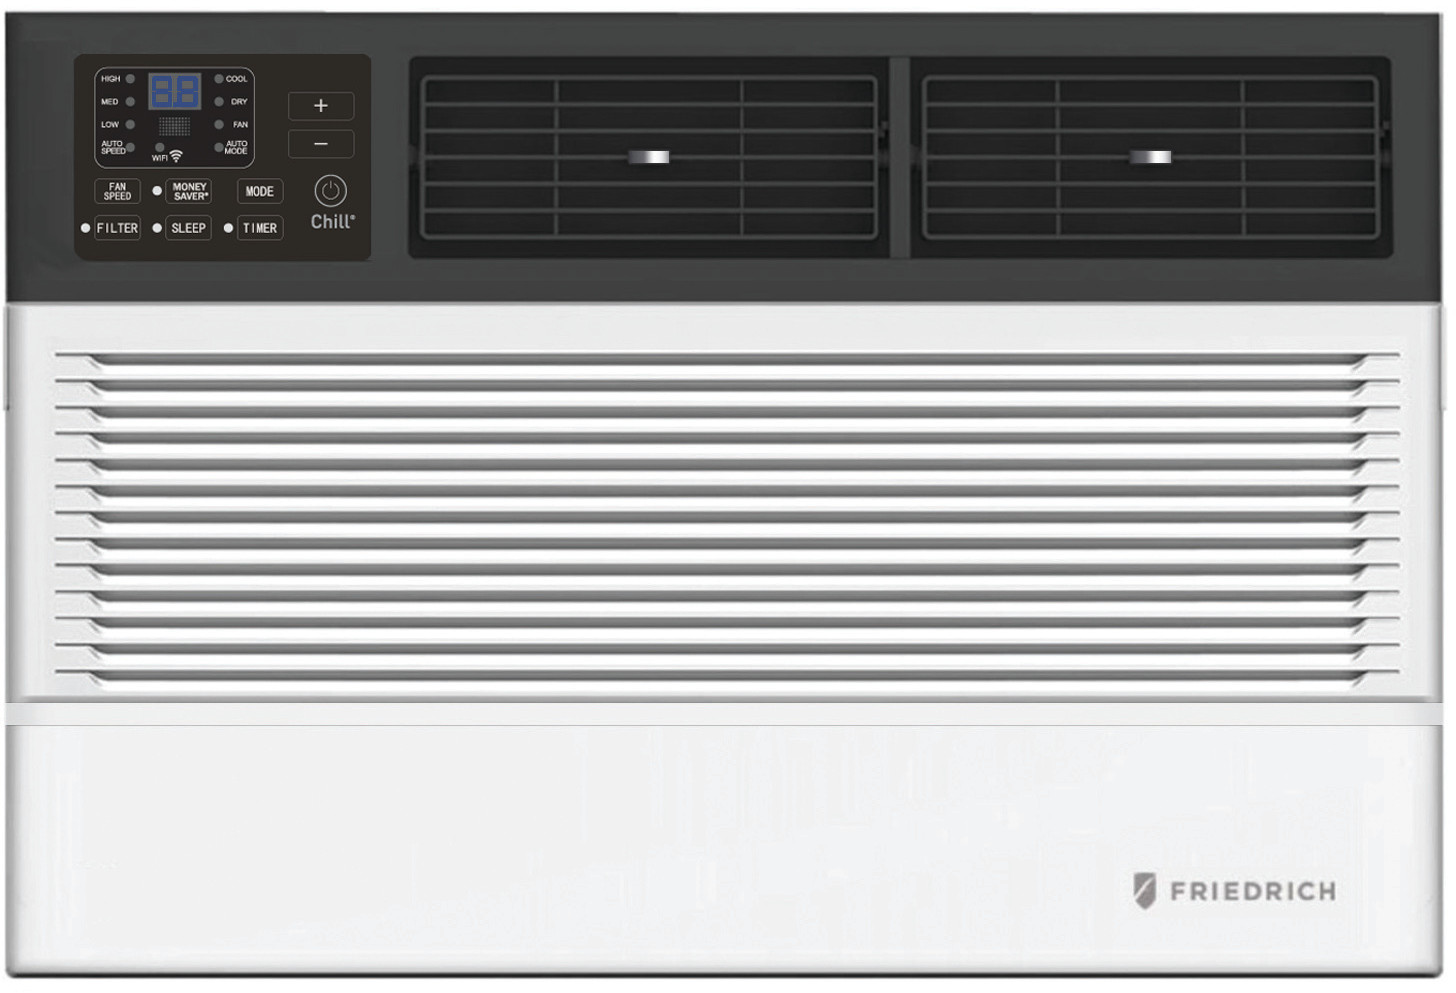 Friedrich Chill Premier 12,000 BTU Window Air Conditioner CCF12A10A